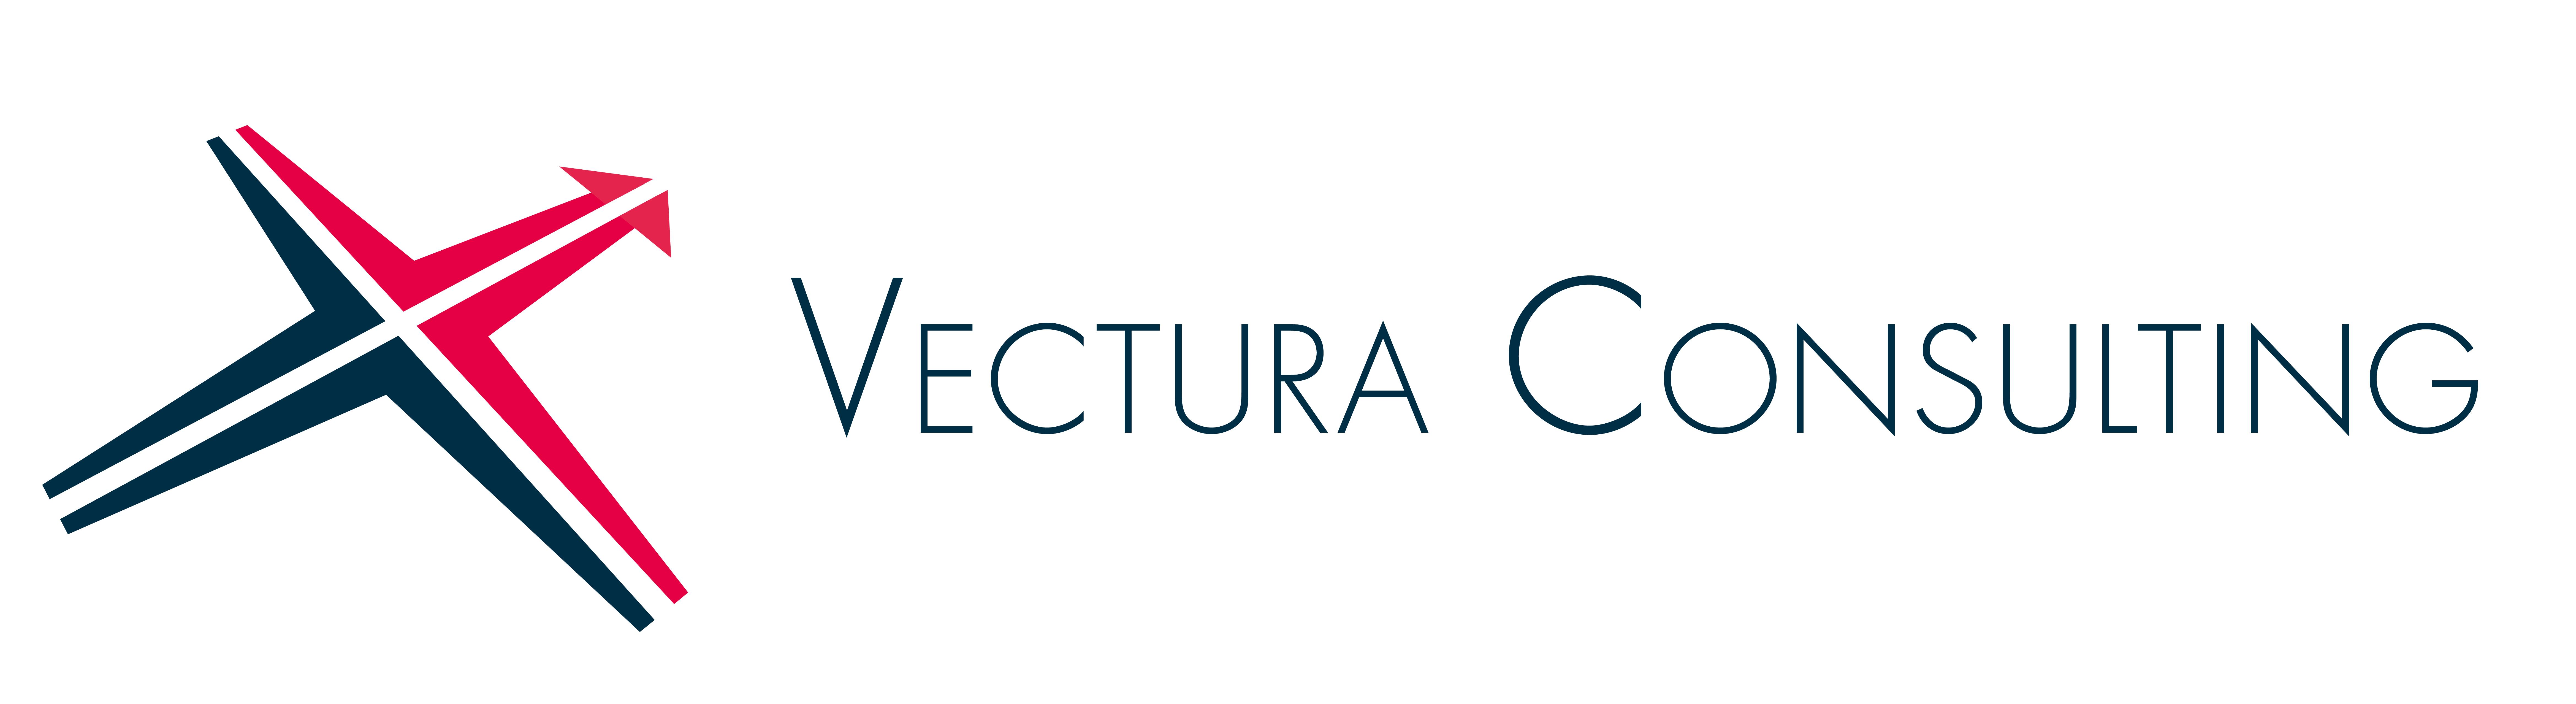 VECTURA Consulting